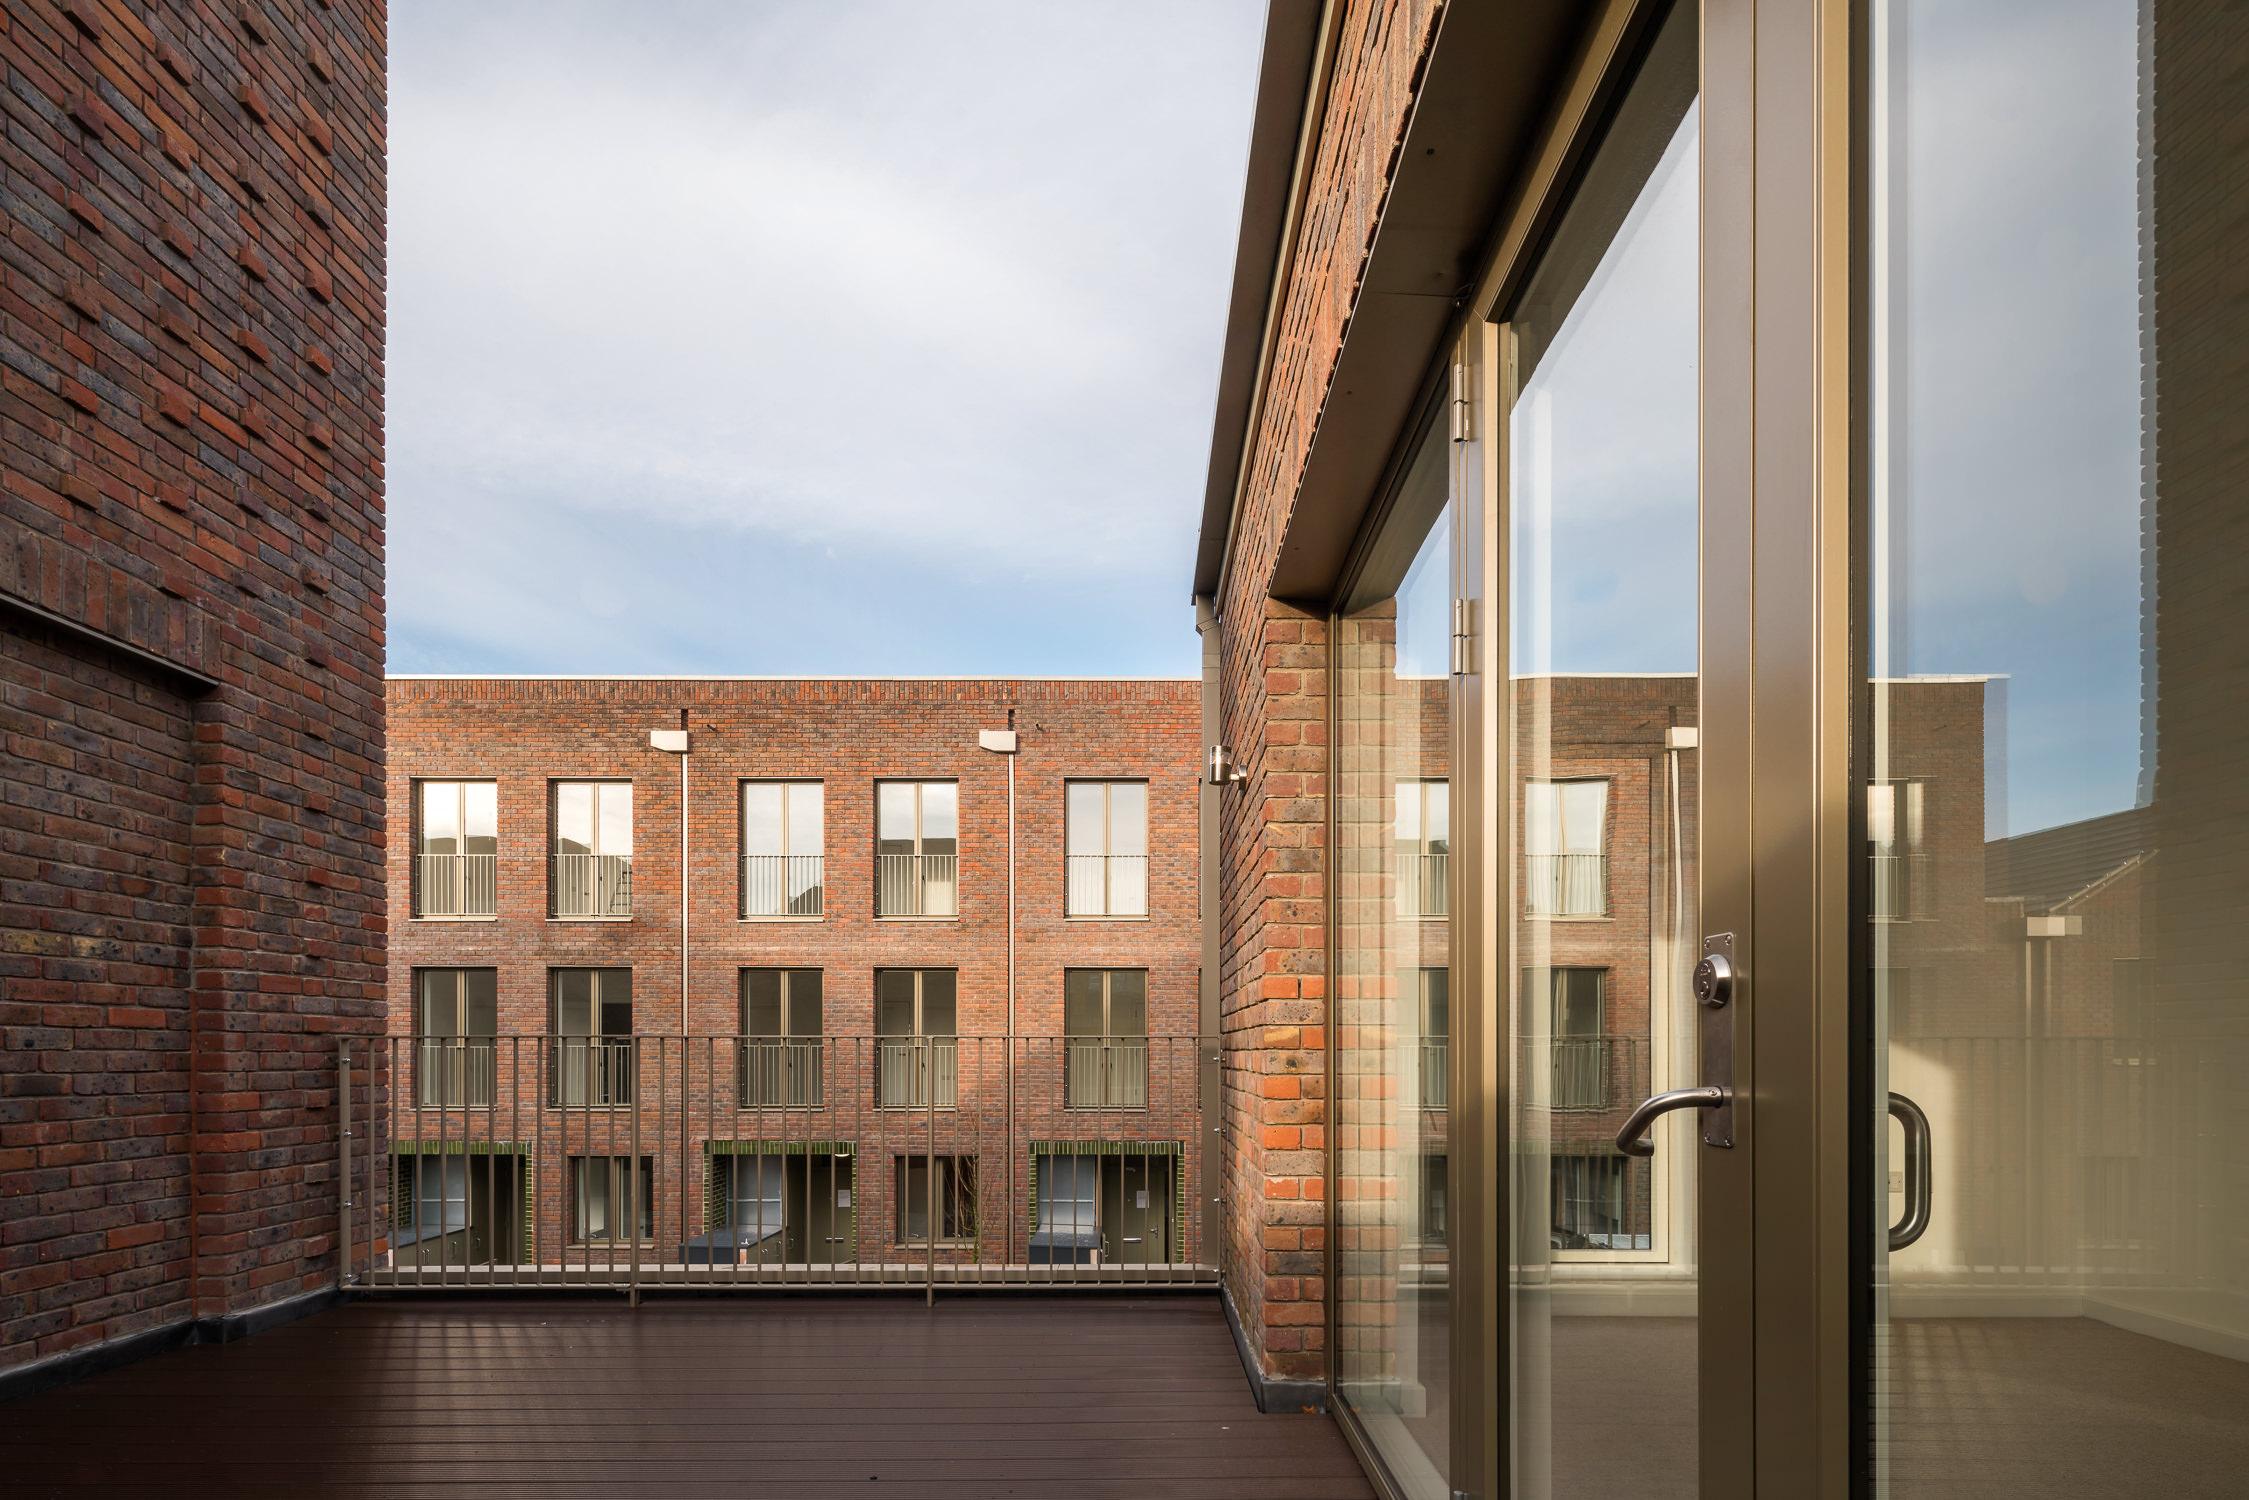 mark-hadden-architecture-photographer-architectuur-interieur-fotografie-london-amsterdam-Dujardin Mews-084.jpg